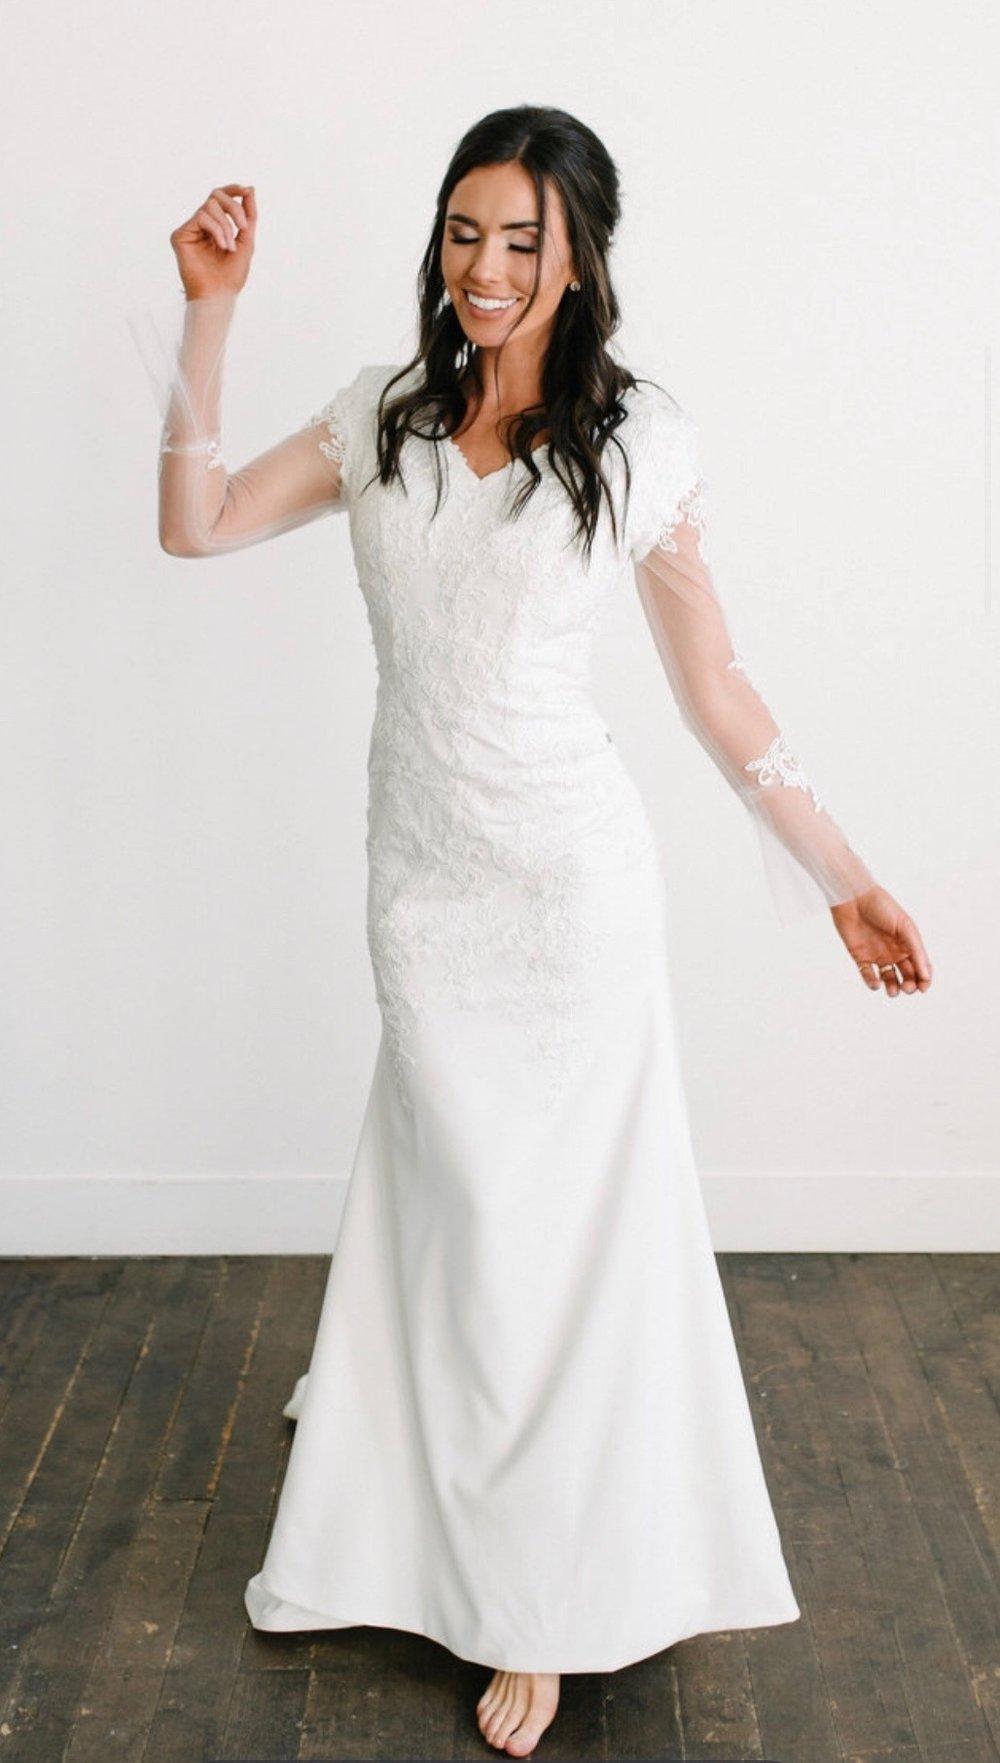 Alaia Modest Wedding Dress